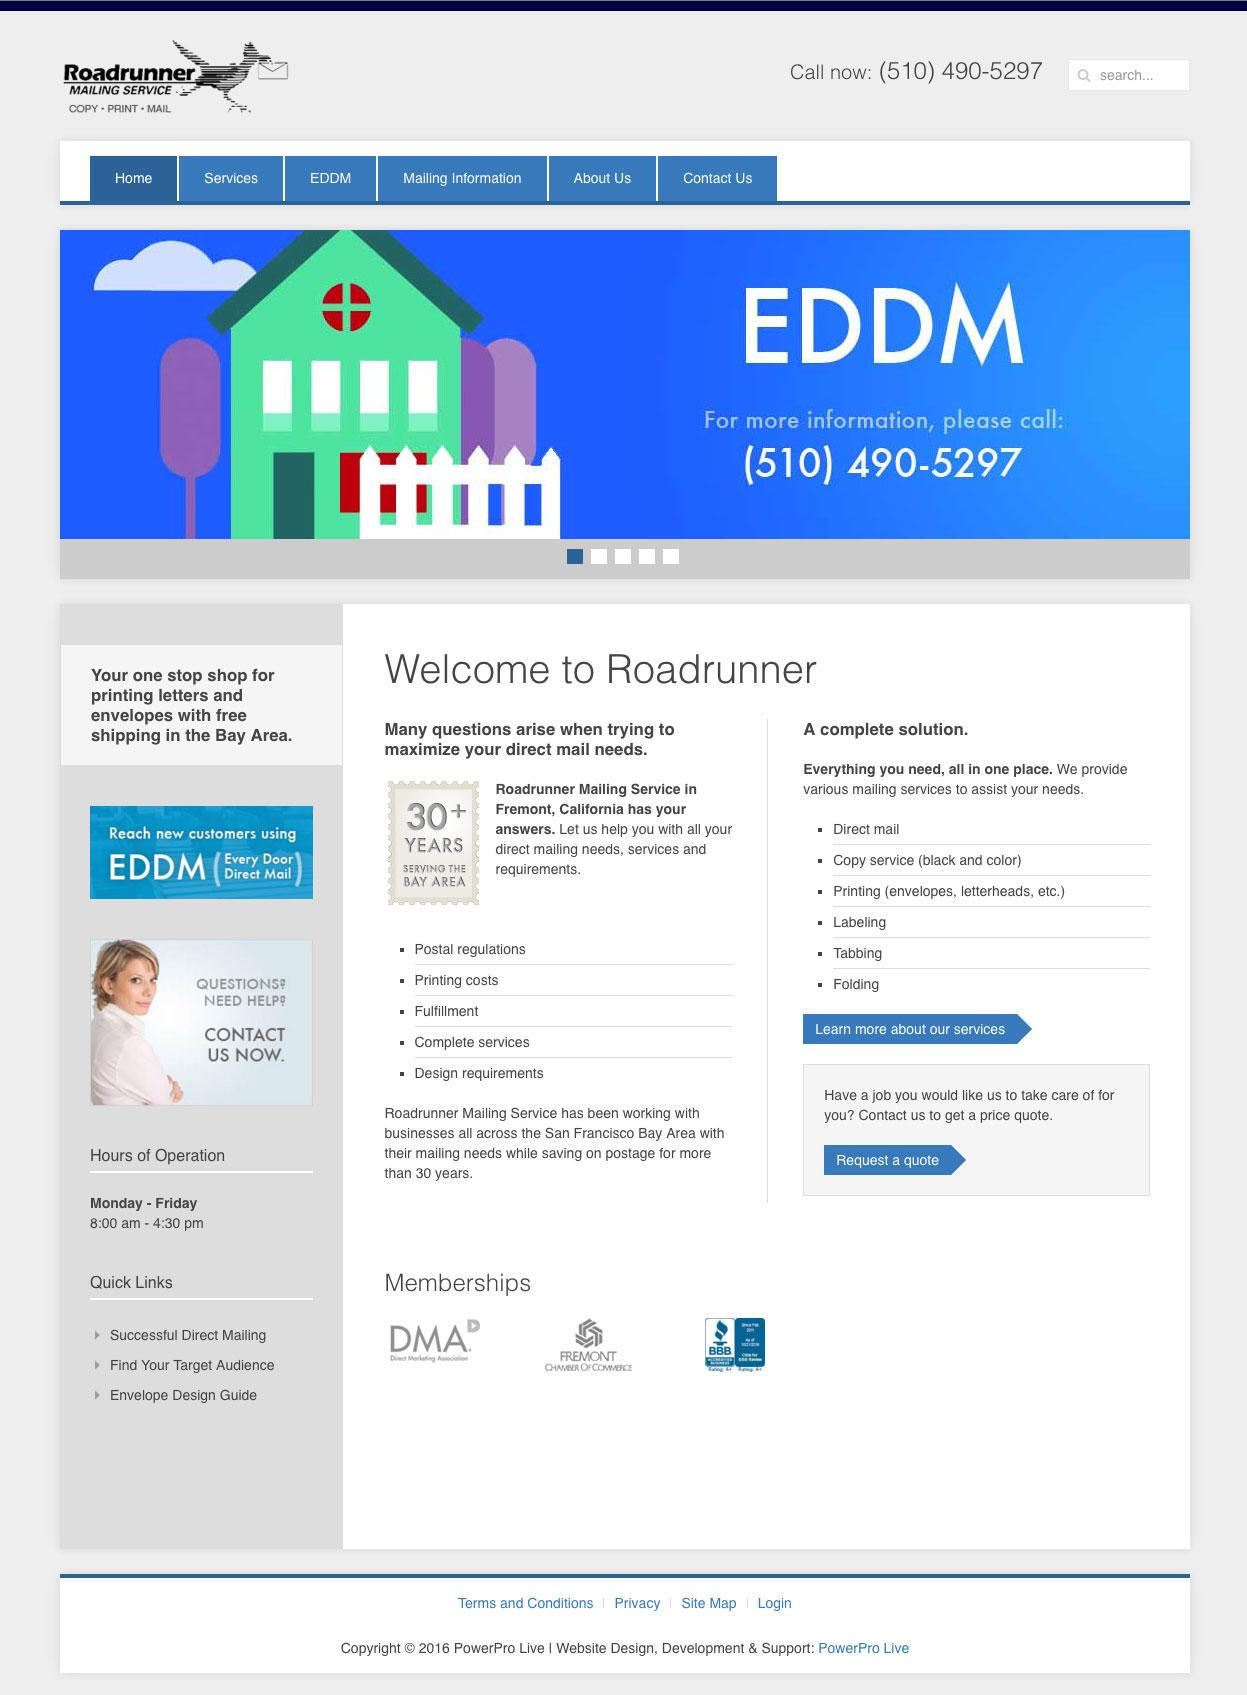 roadrunner-mailing-website